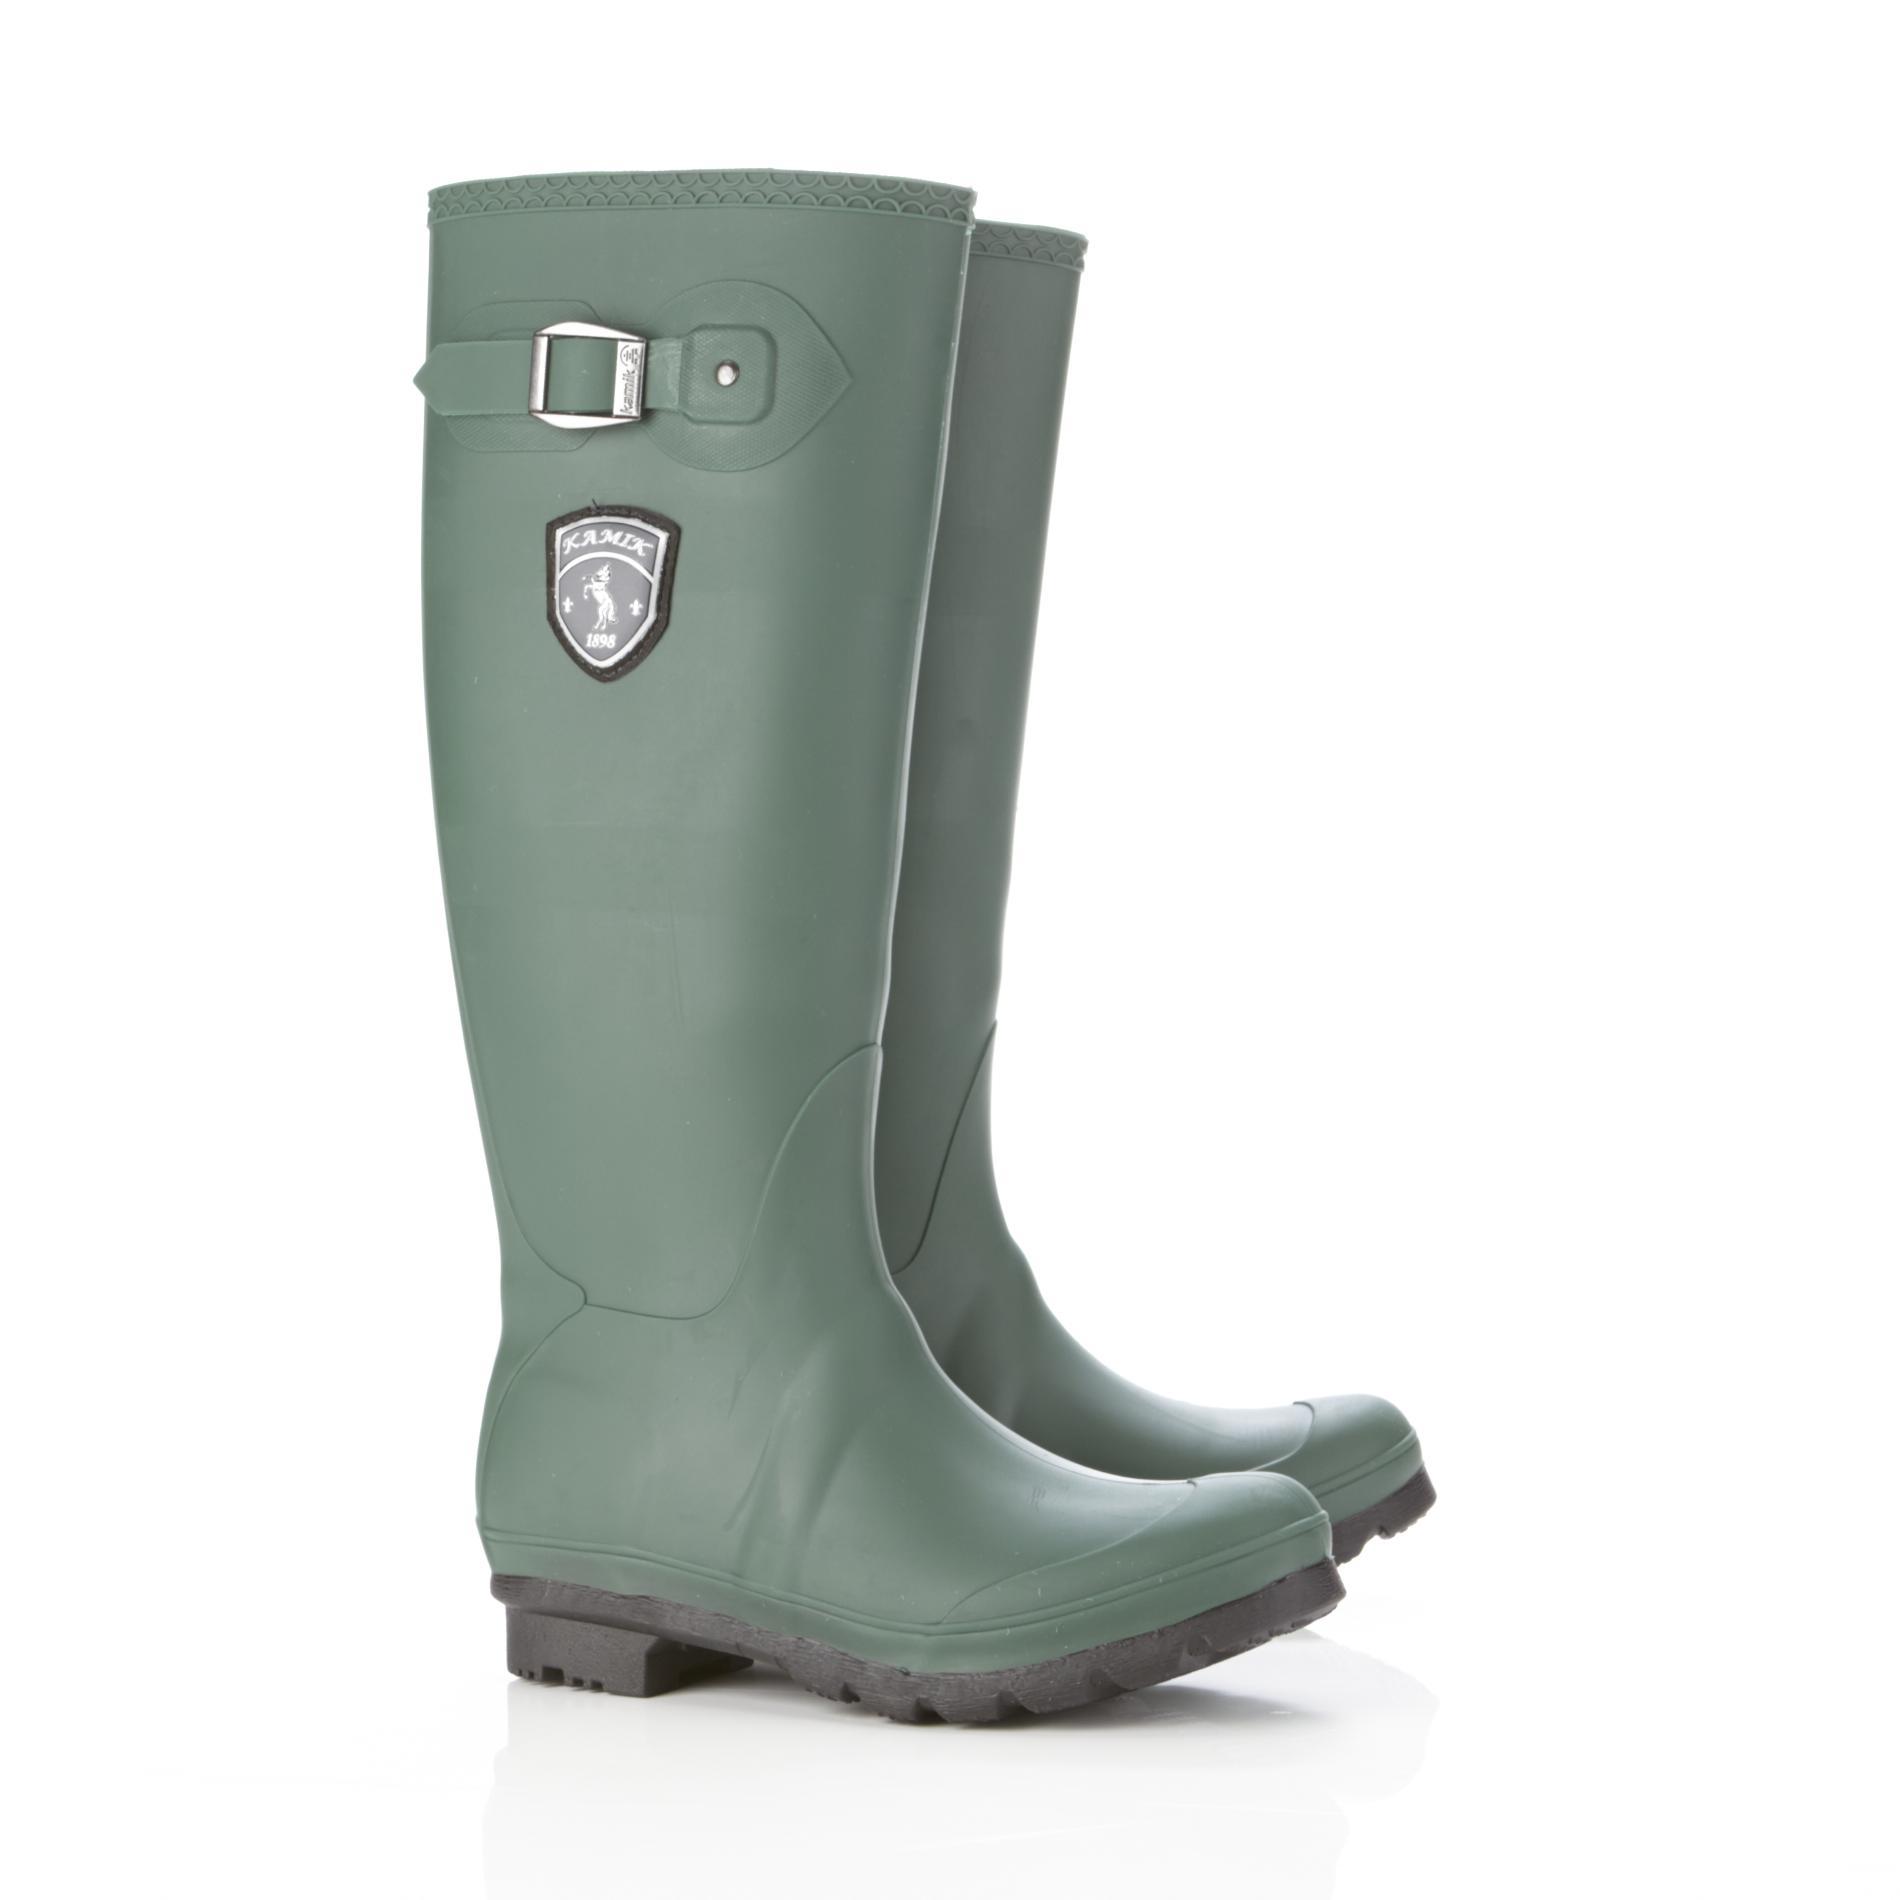 Knee High Rain Boots mpDI0PEA